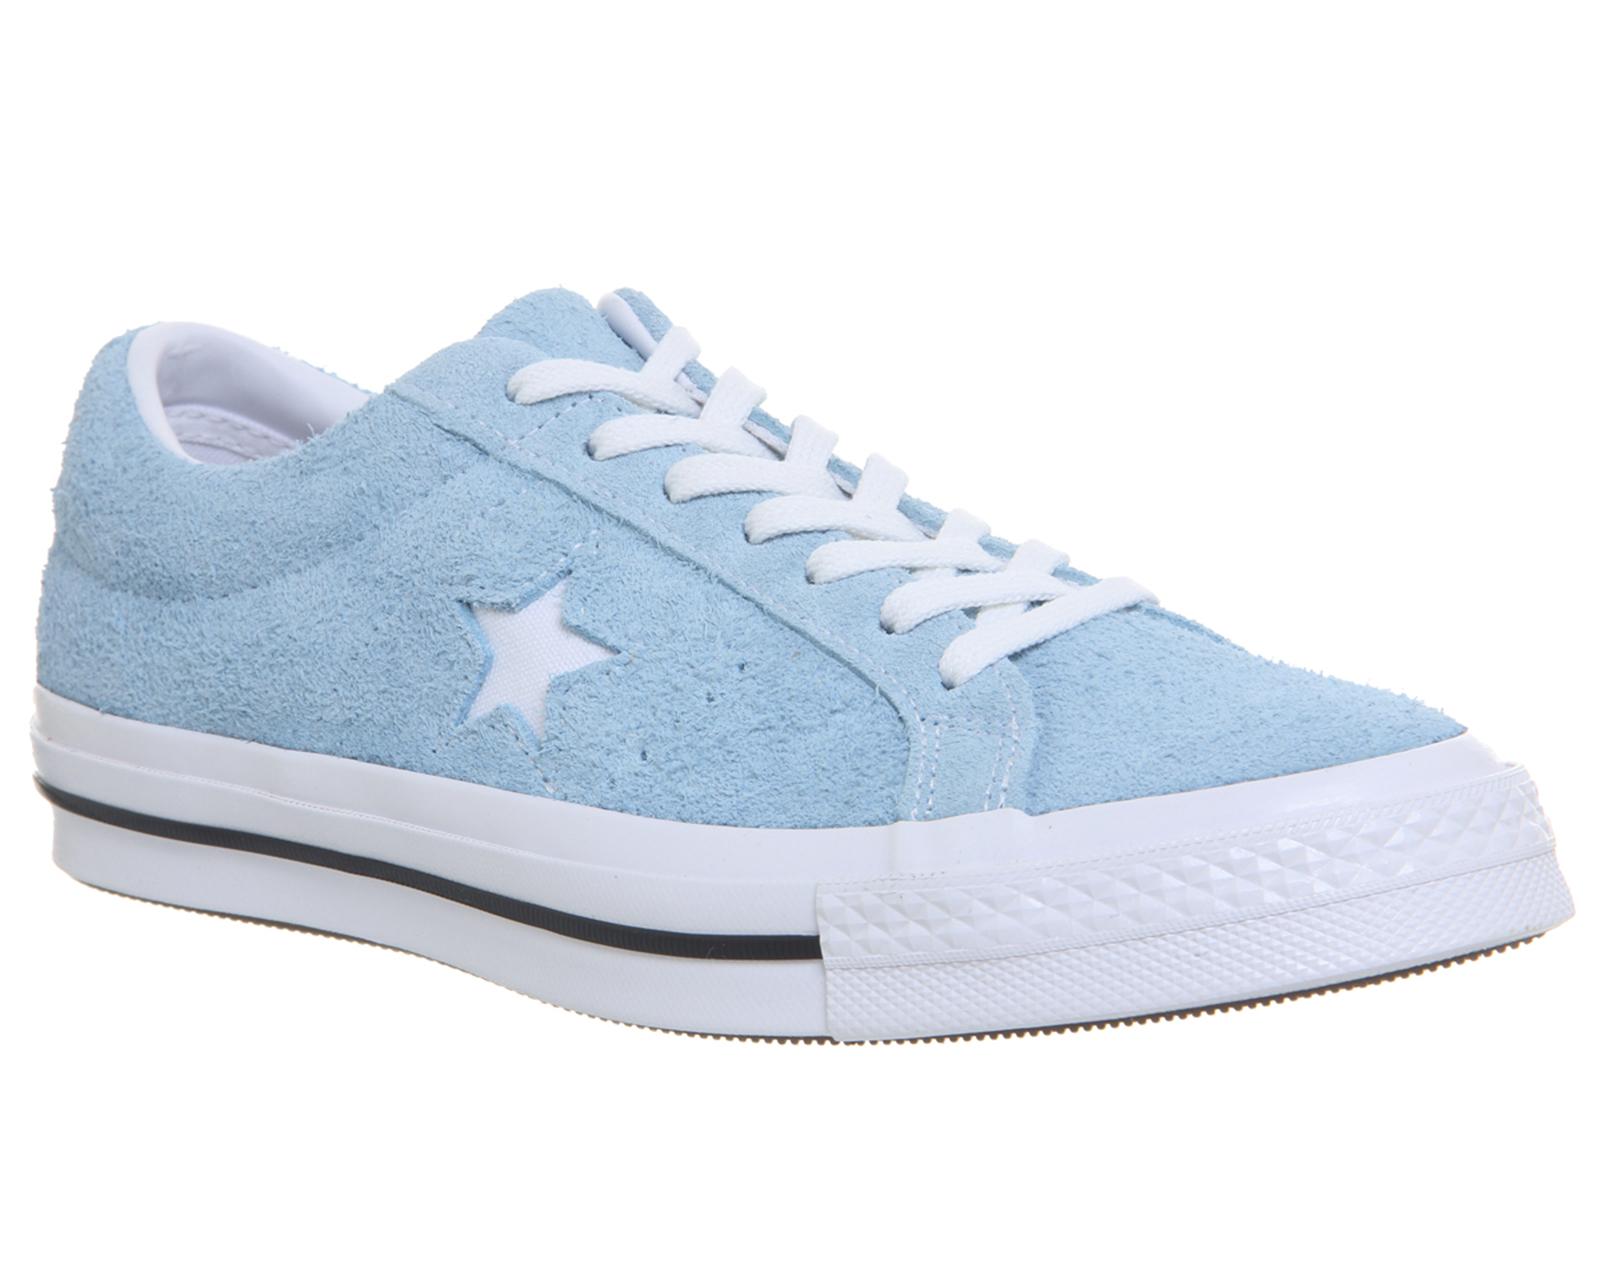 Womens Converse One Star Trainers Shoreline Blue White Trainers ... 09ec7d4cb7